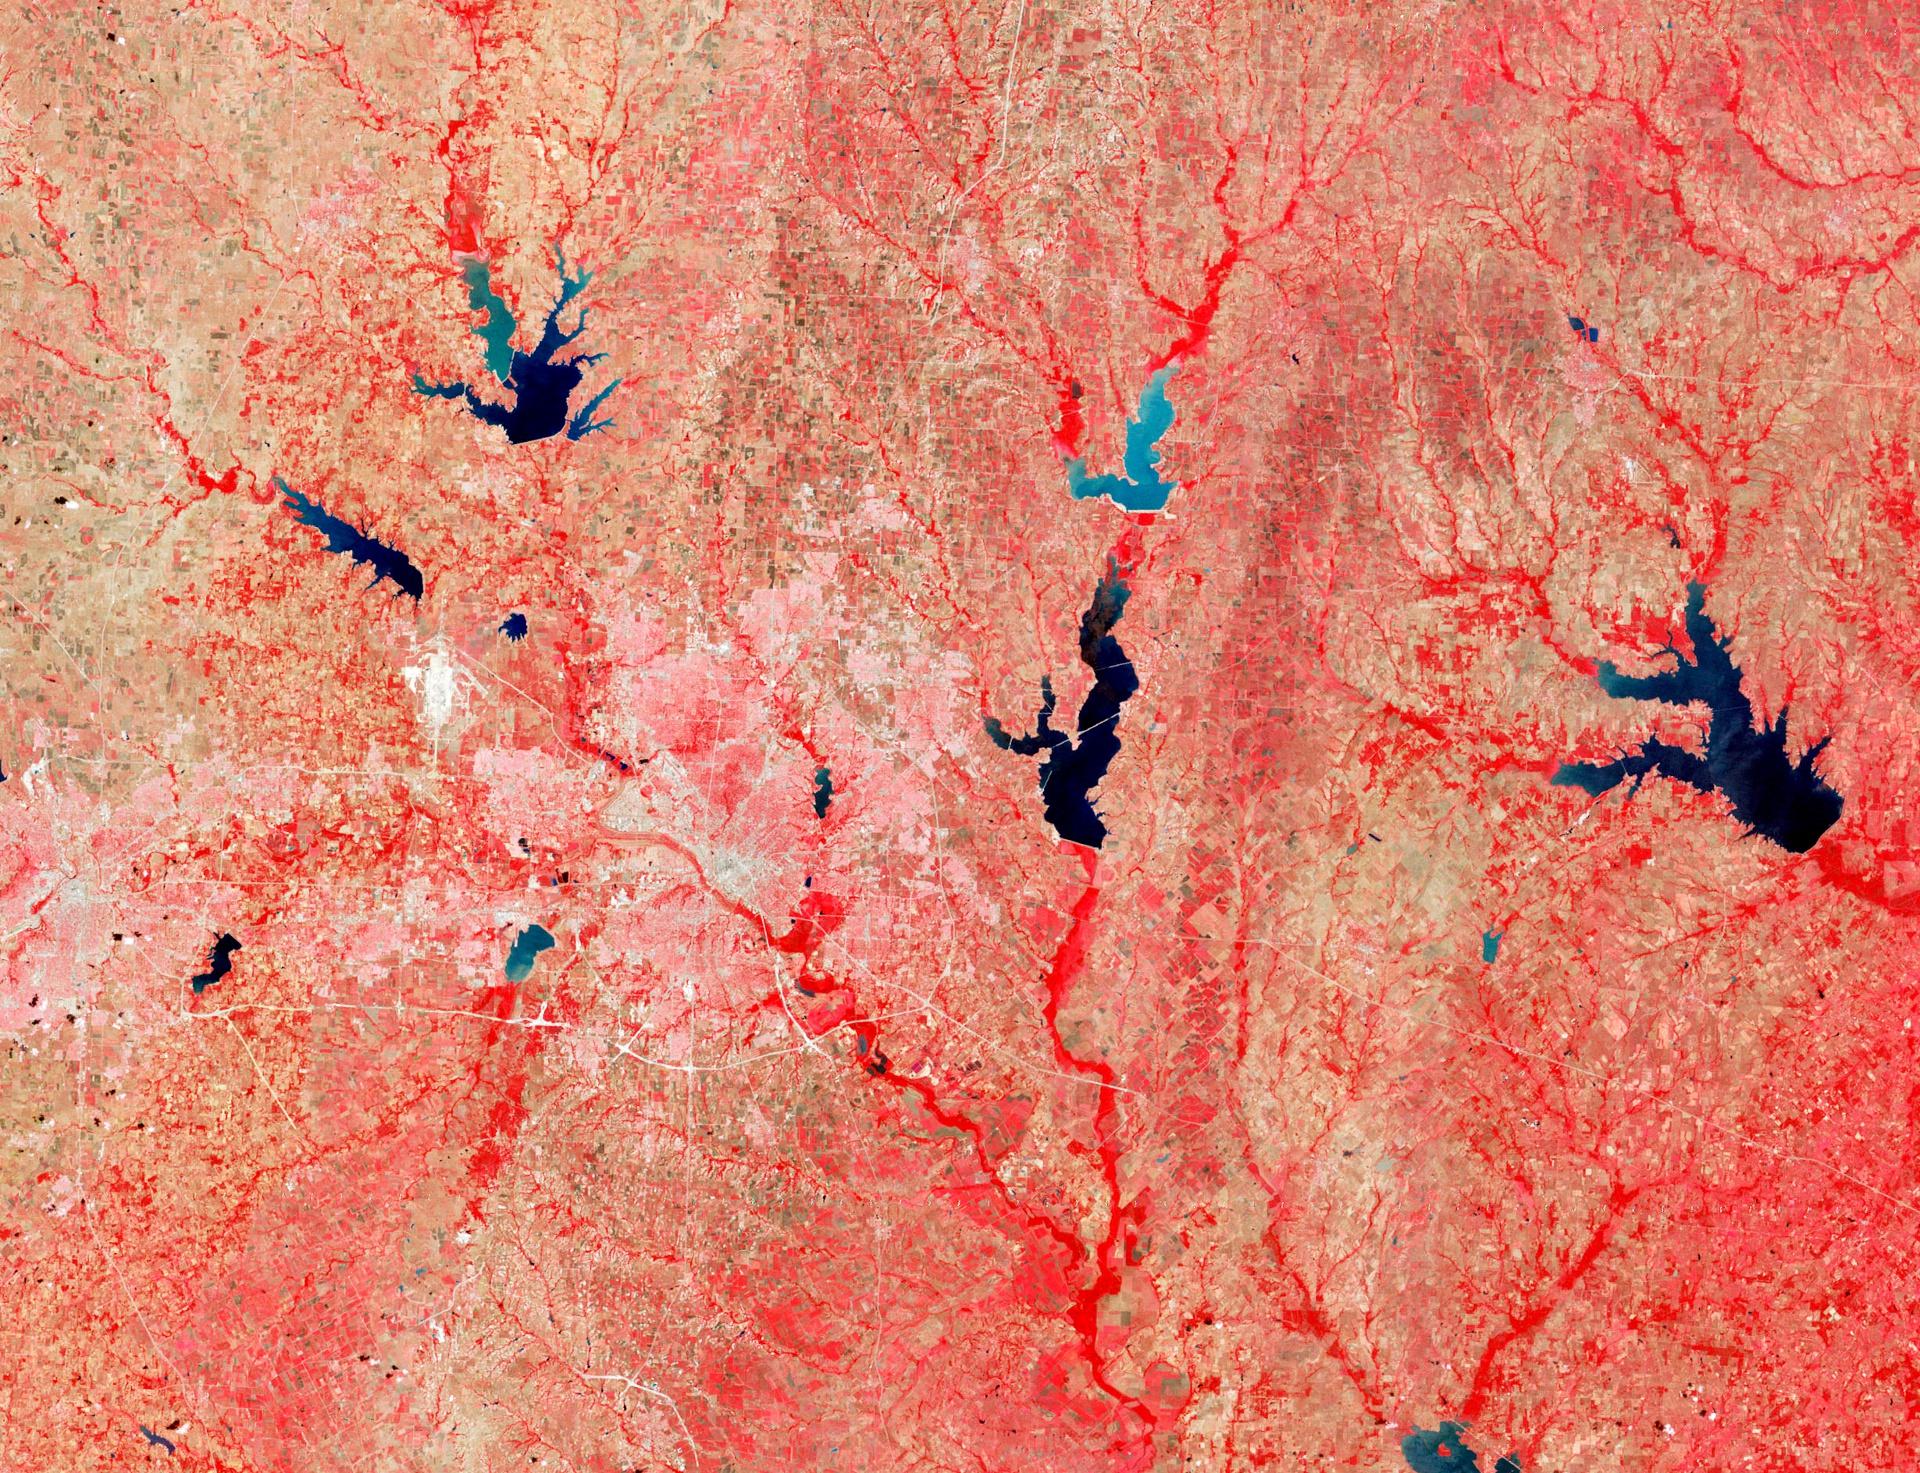 Quiz - image - satellite et environnement - observation de la Terre - Earth Observation - Remote sensing - Juillet 2015